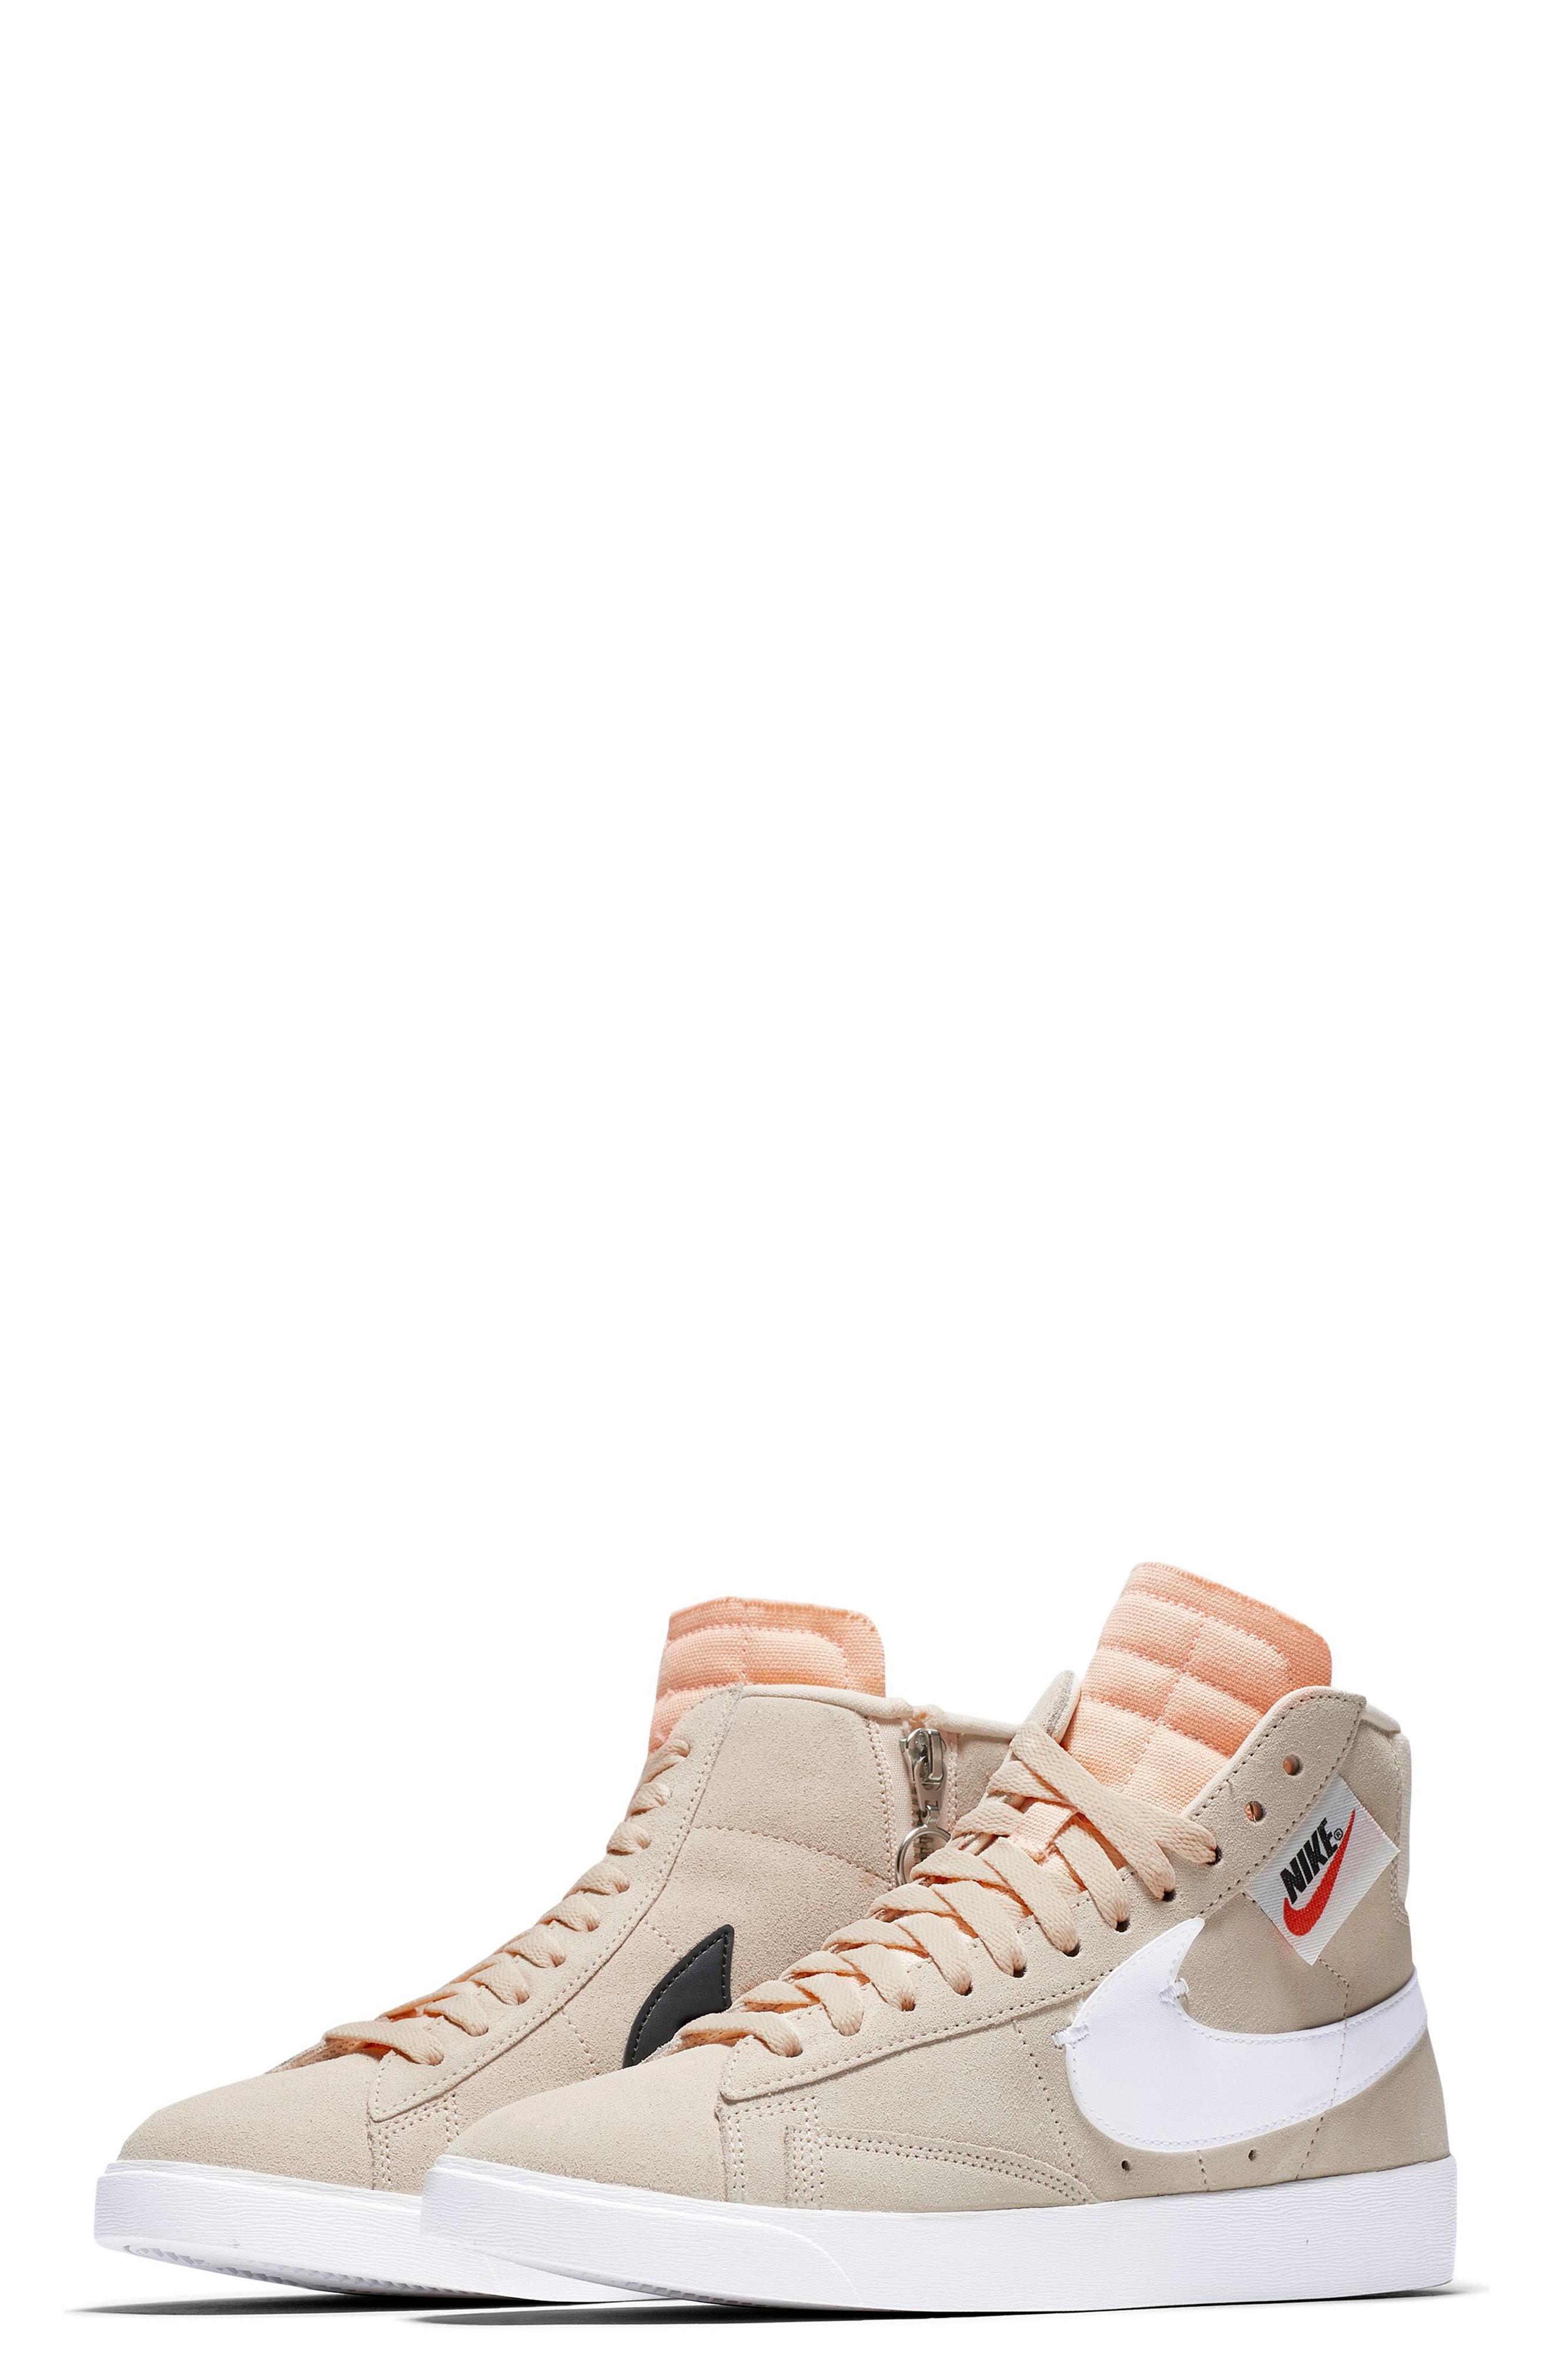 14fbacb9390dcc Lyst - Nike Blazer Mid Rebel Sneaker in Orange